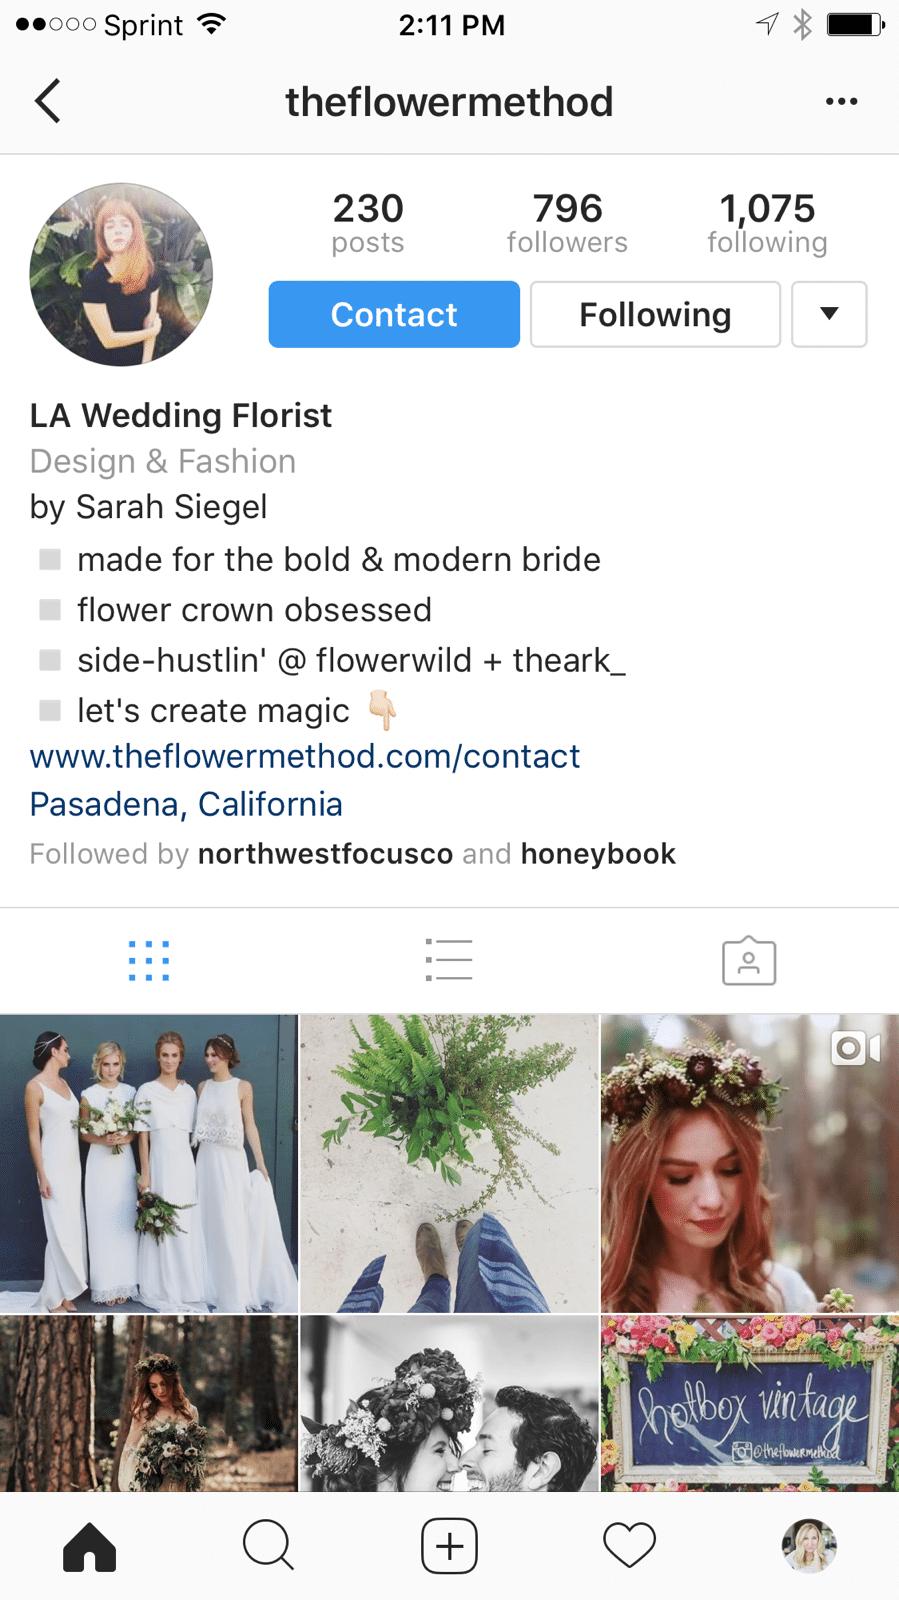 How To Write An Instagram Bio That Gets Leads With Examples Inhouss Instagram Bio Facebook Bio Insta Bio